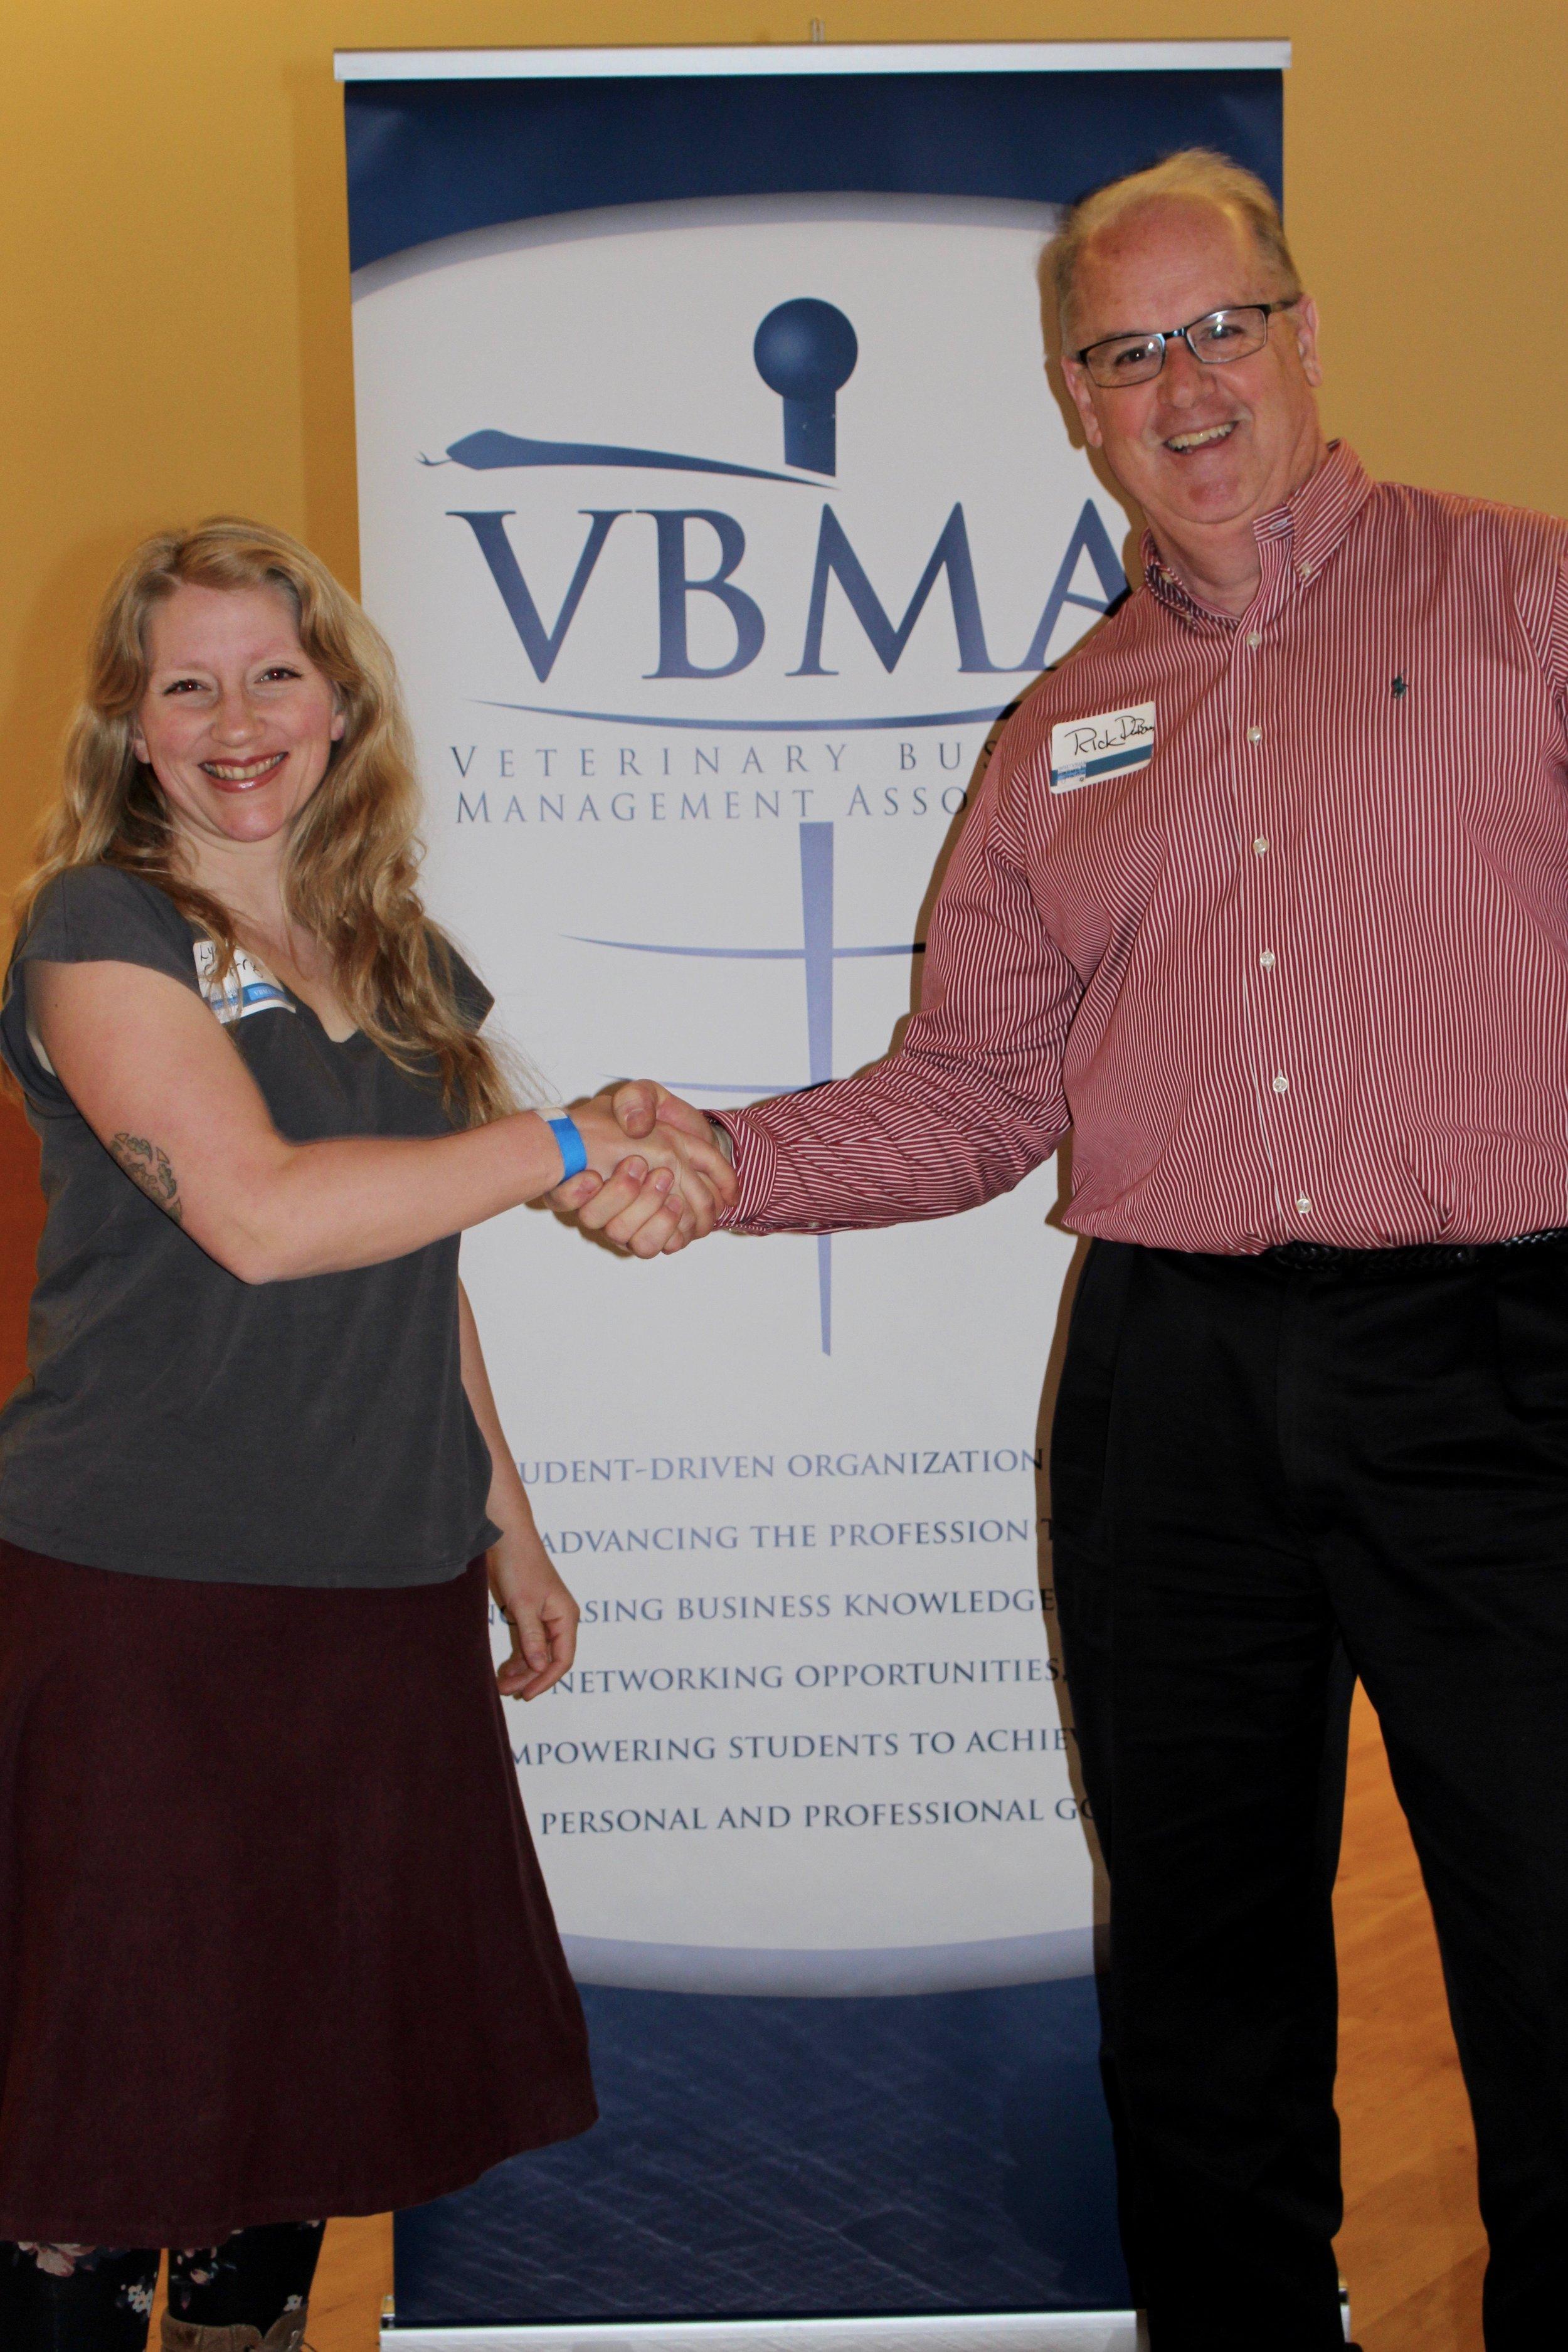 VBMA Partners in Practice - 78 of 129.jpg